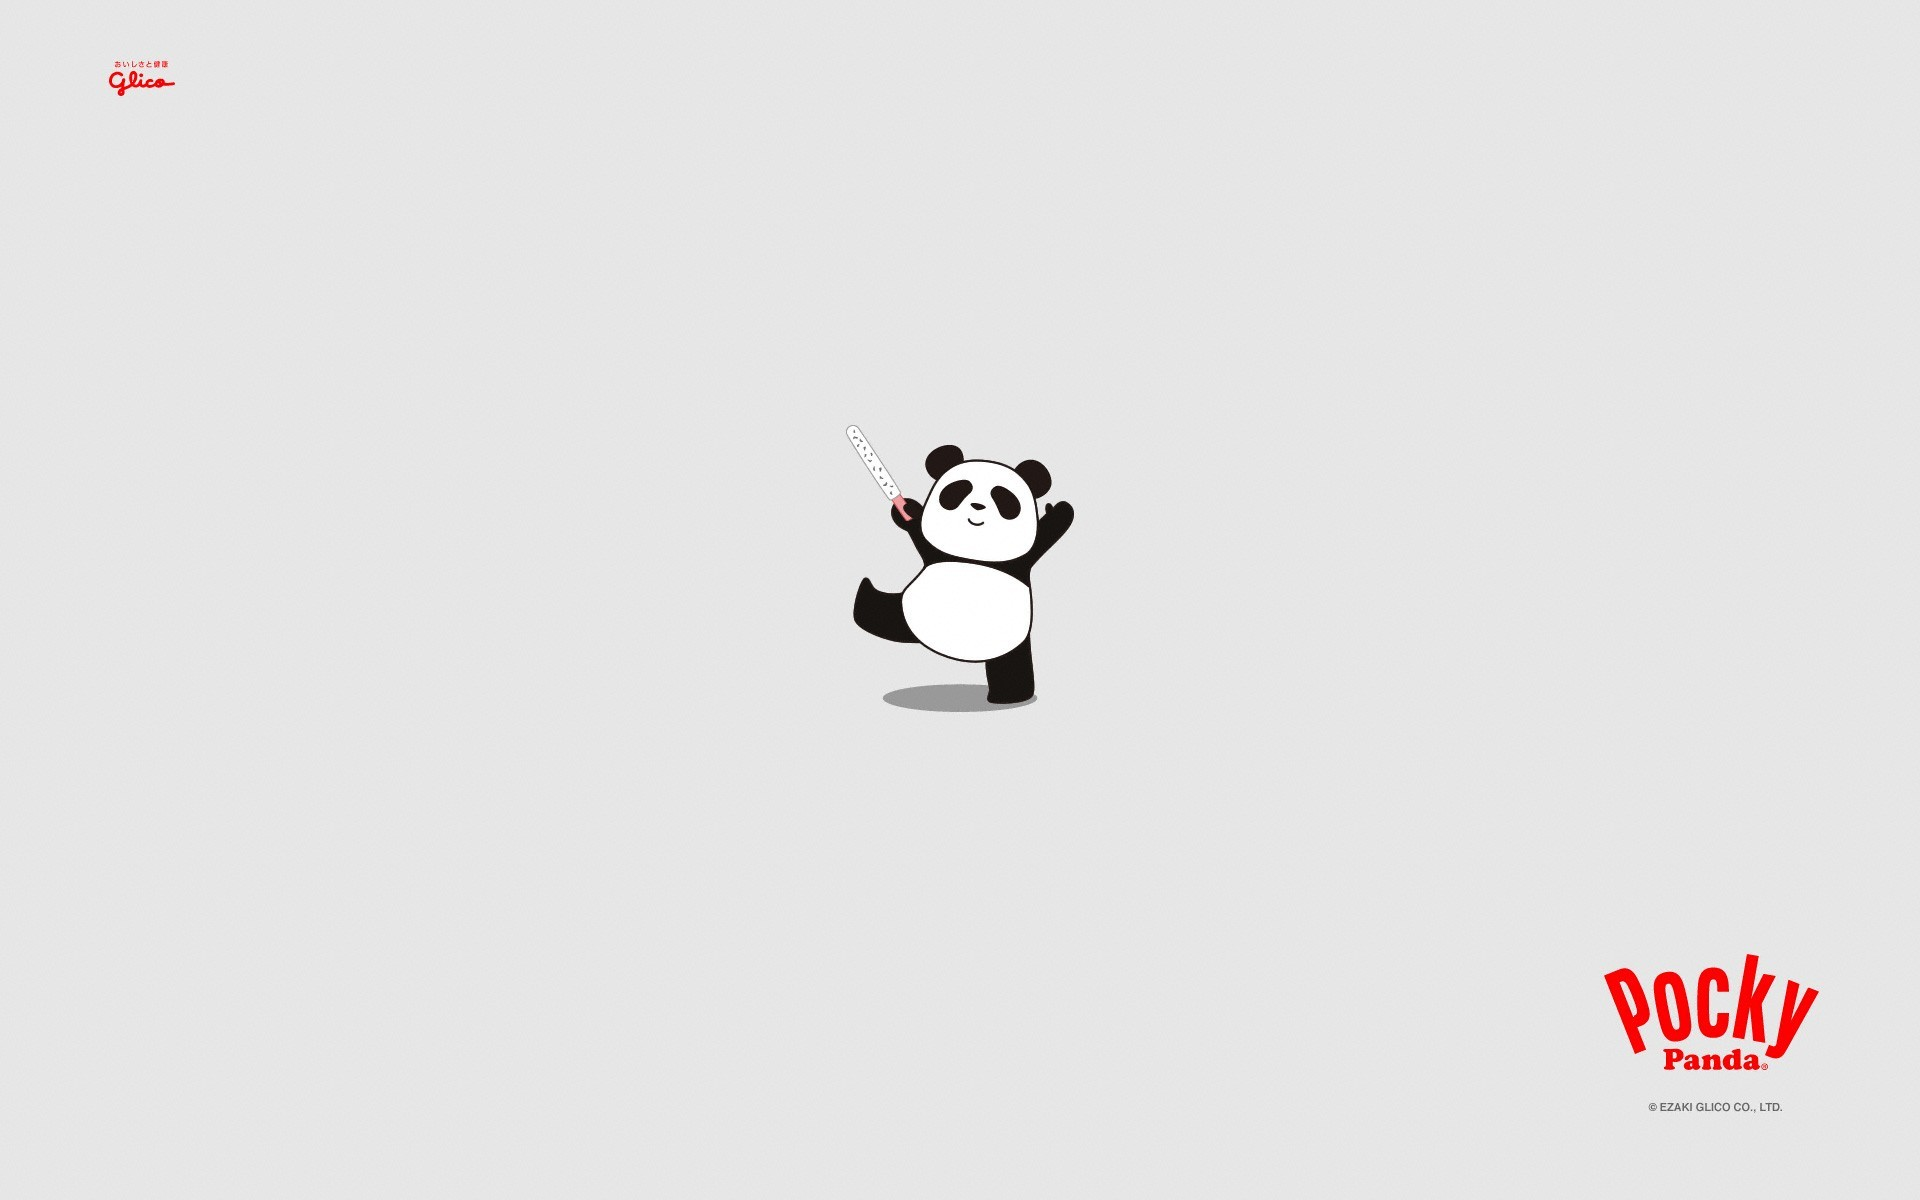 Res: 1920x1200, Wallpapers-Panda-Bears-Gallery-(60-Plus)-PIC-WPW3011591